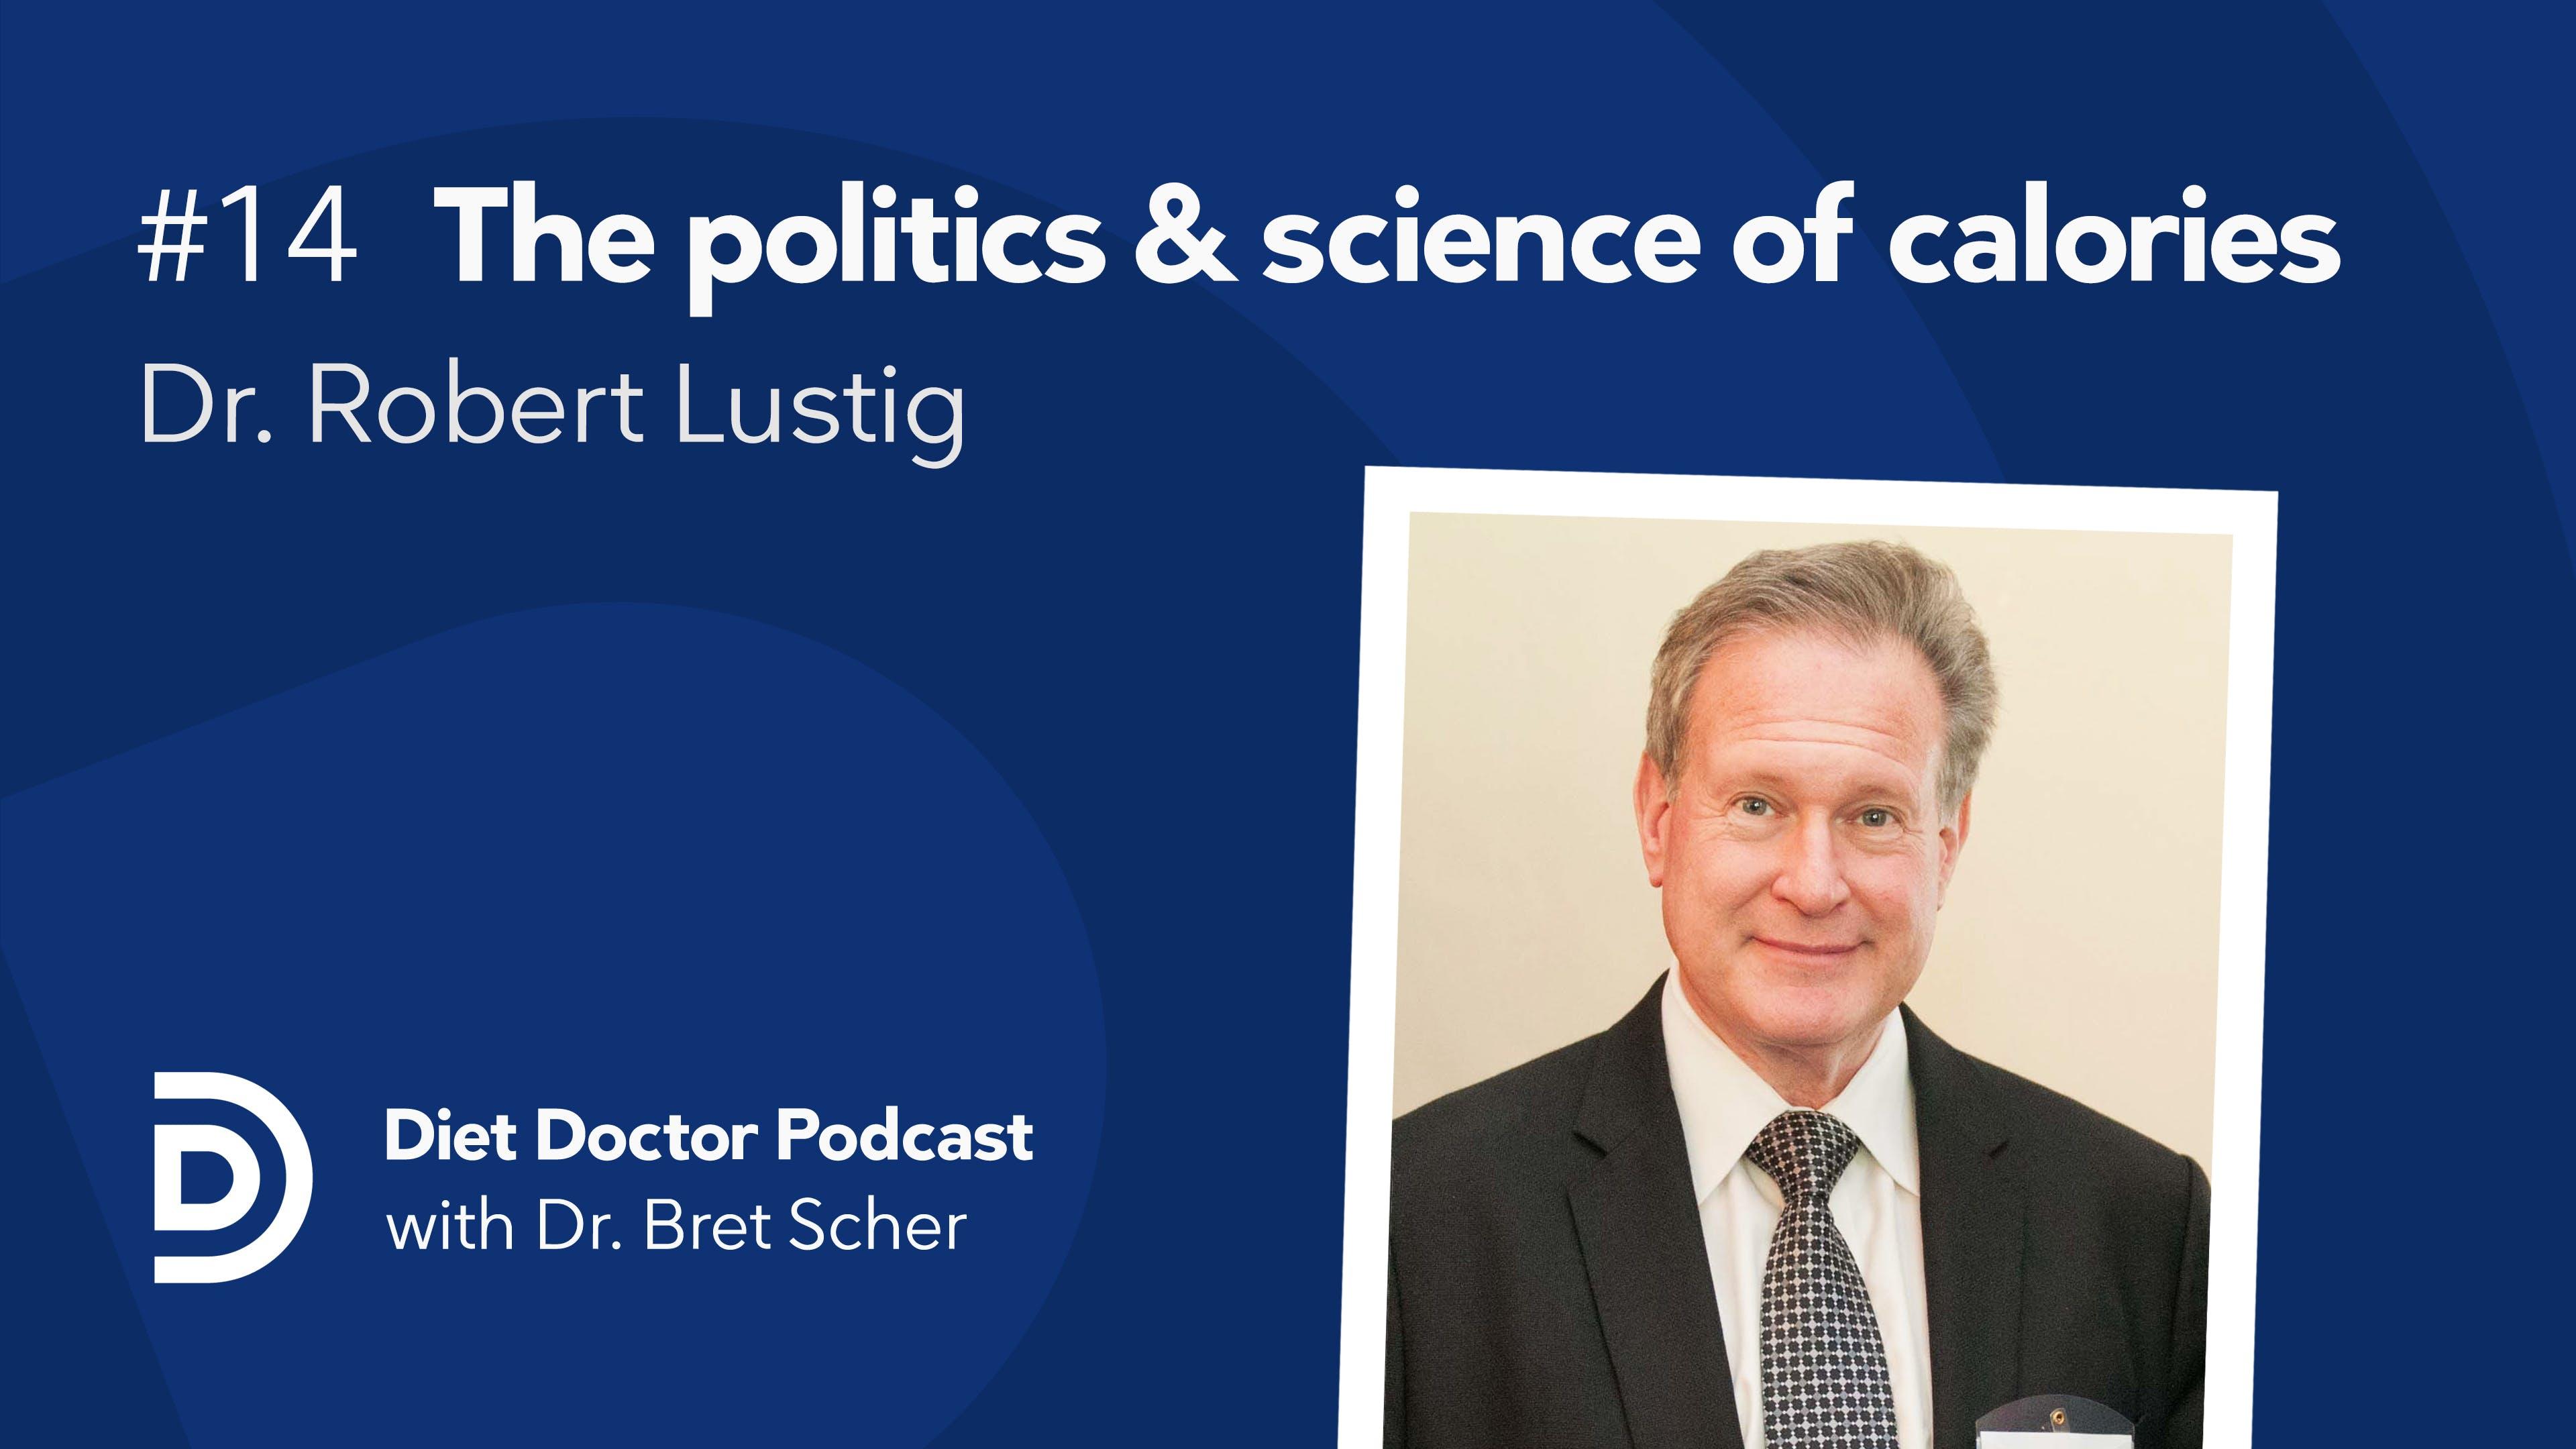 Diet Doctor podcast #14 with Dr. Robert Lustig